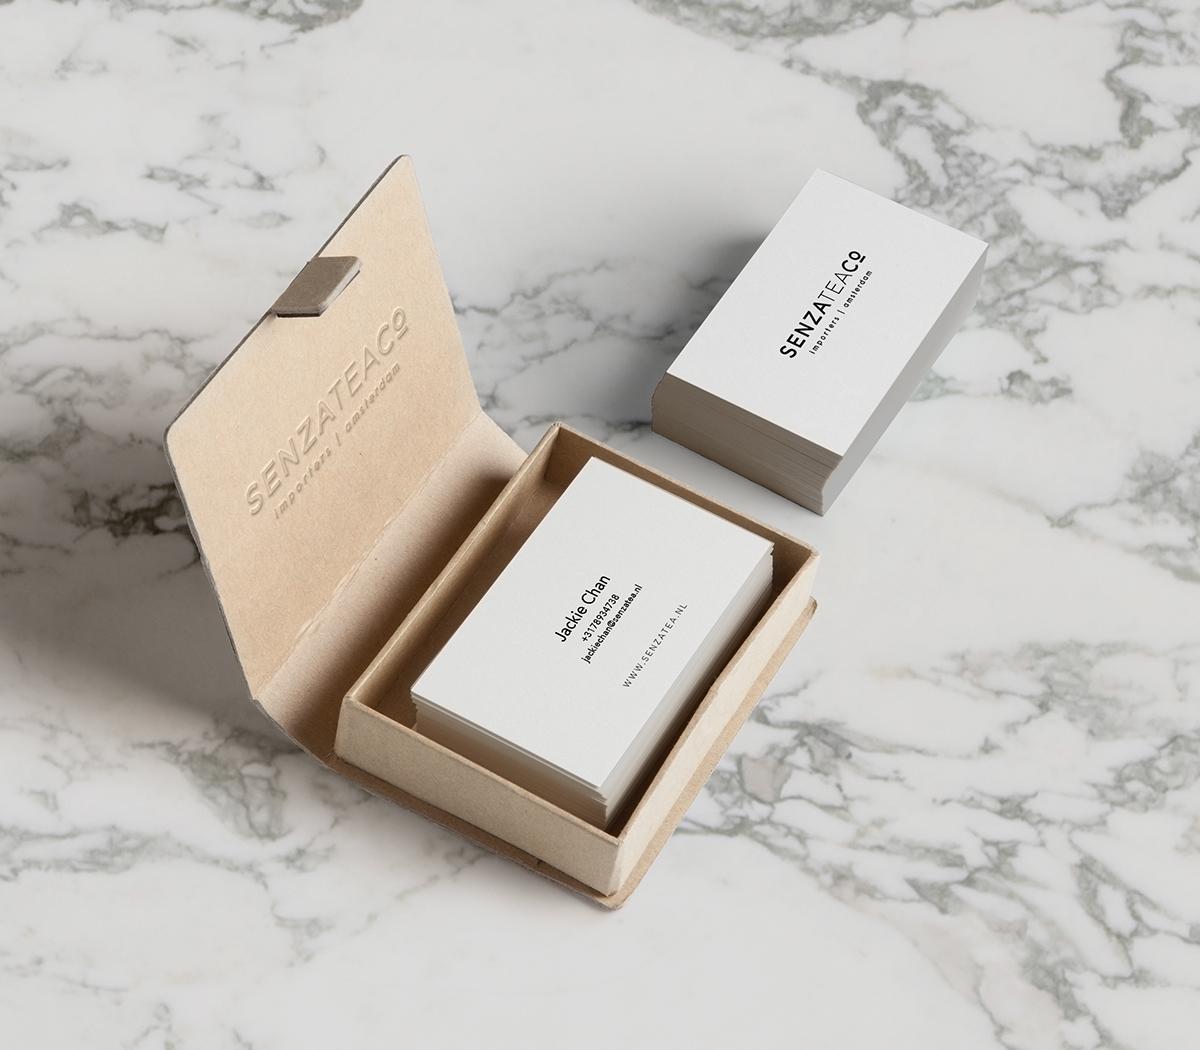 Tea Packaging senza tea company nadine froughi